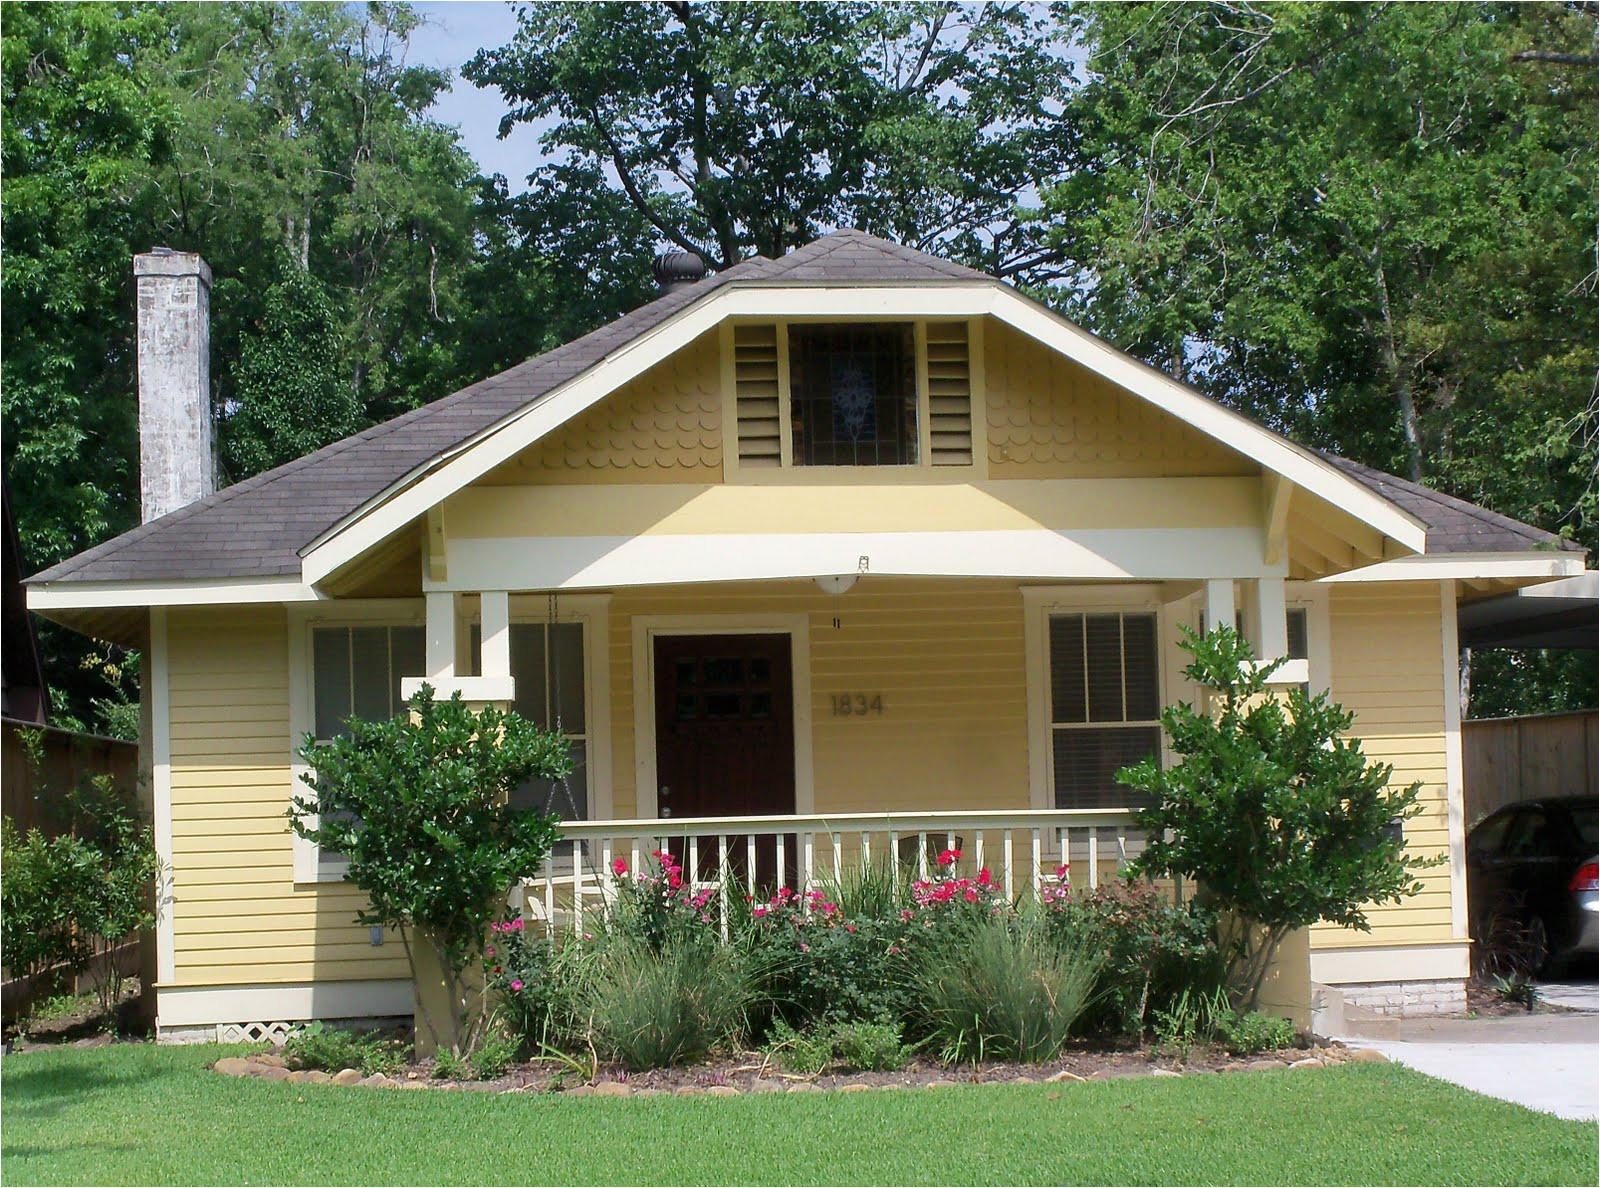 simple house plans ideas